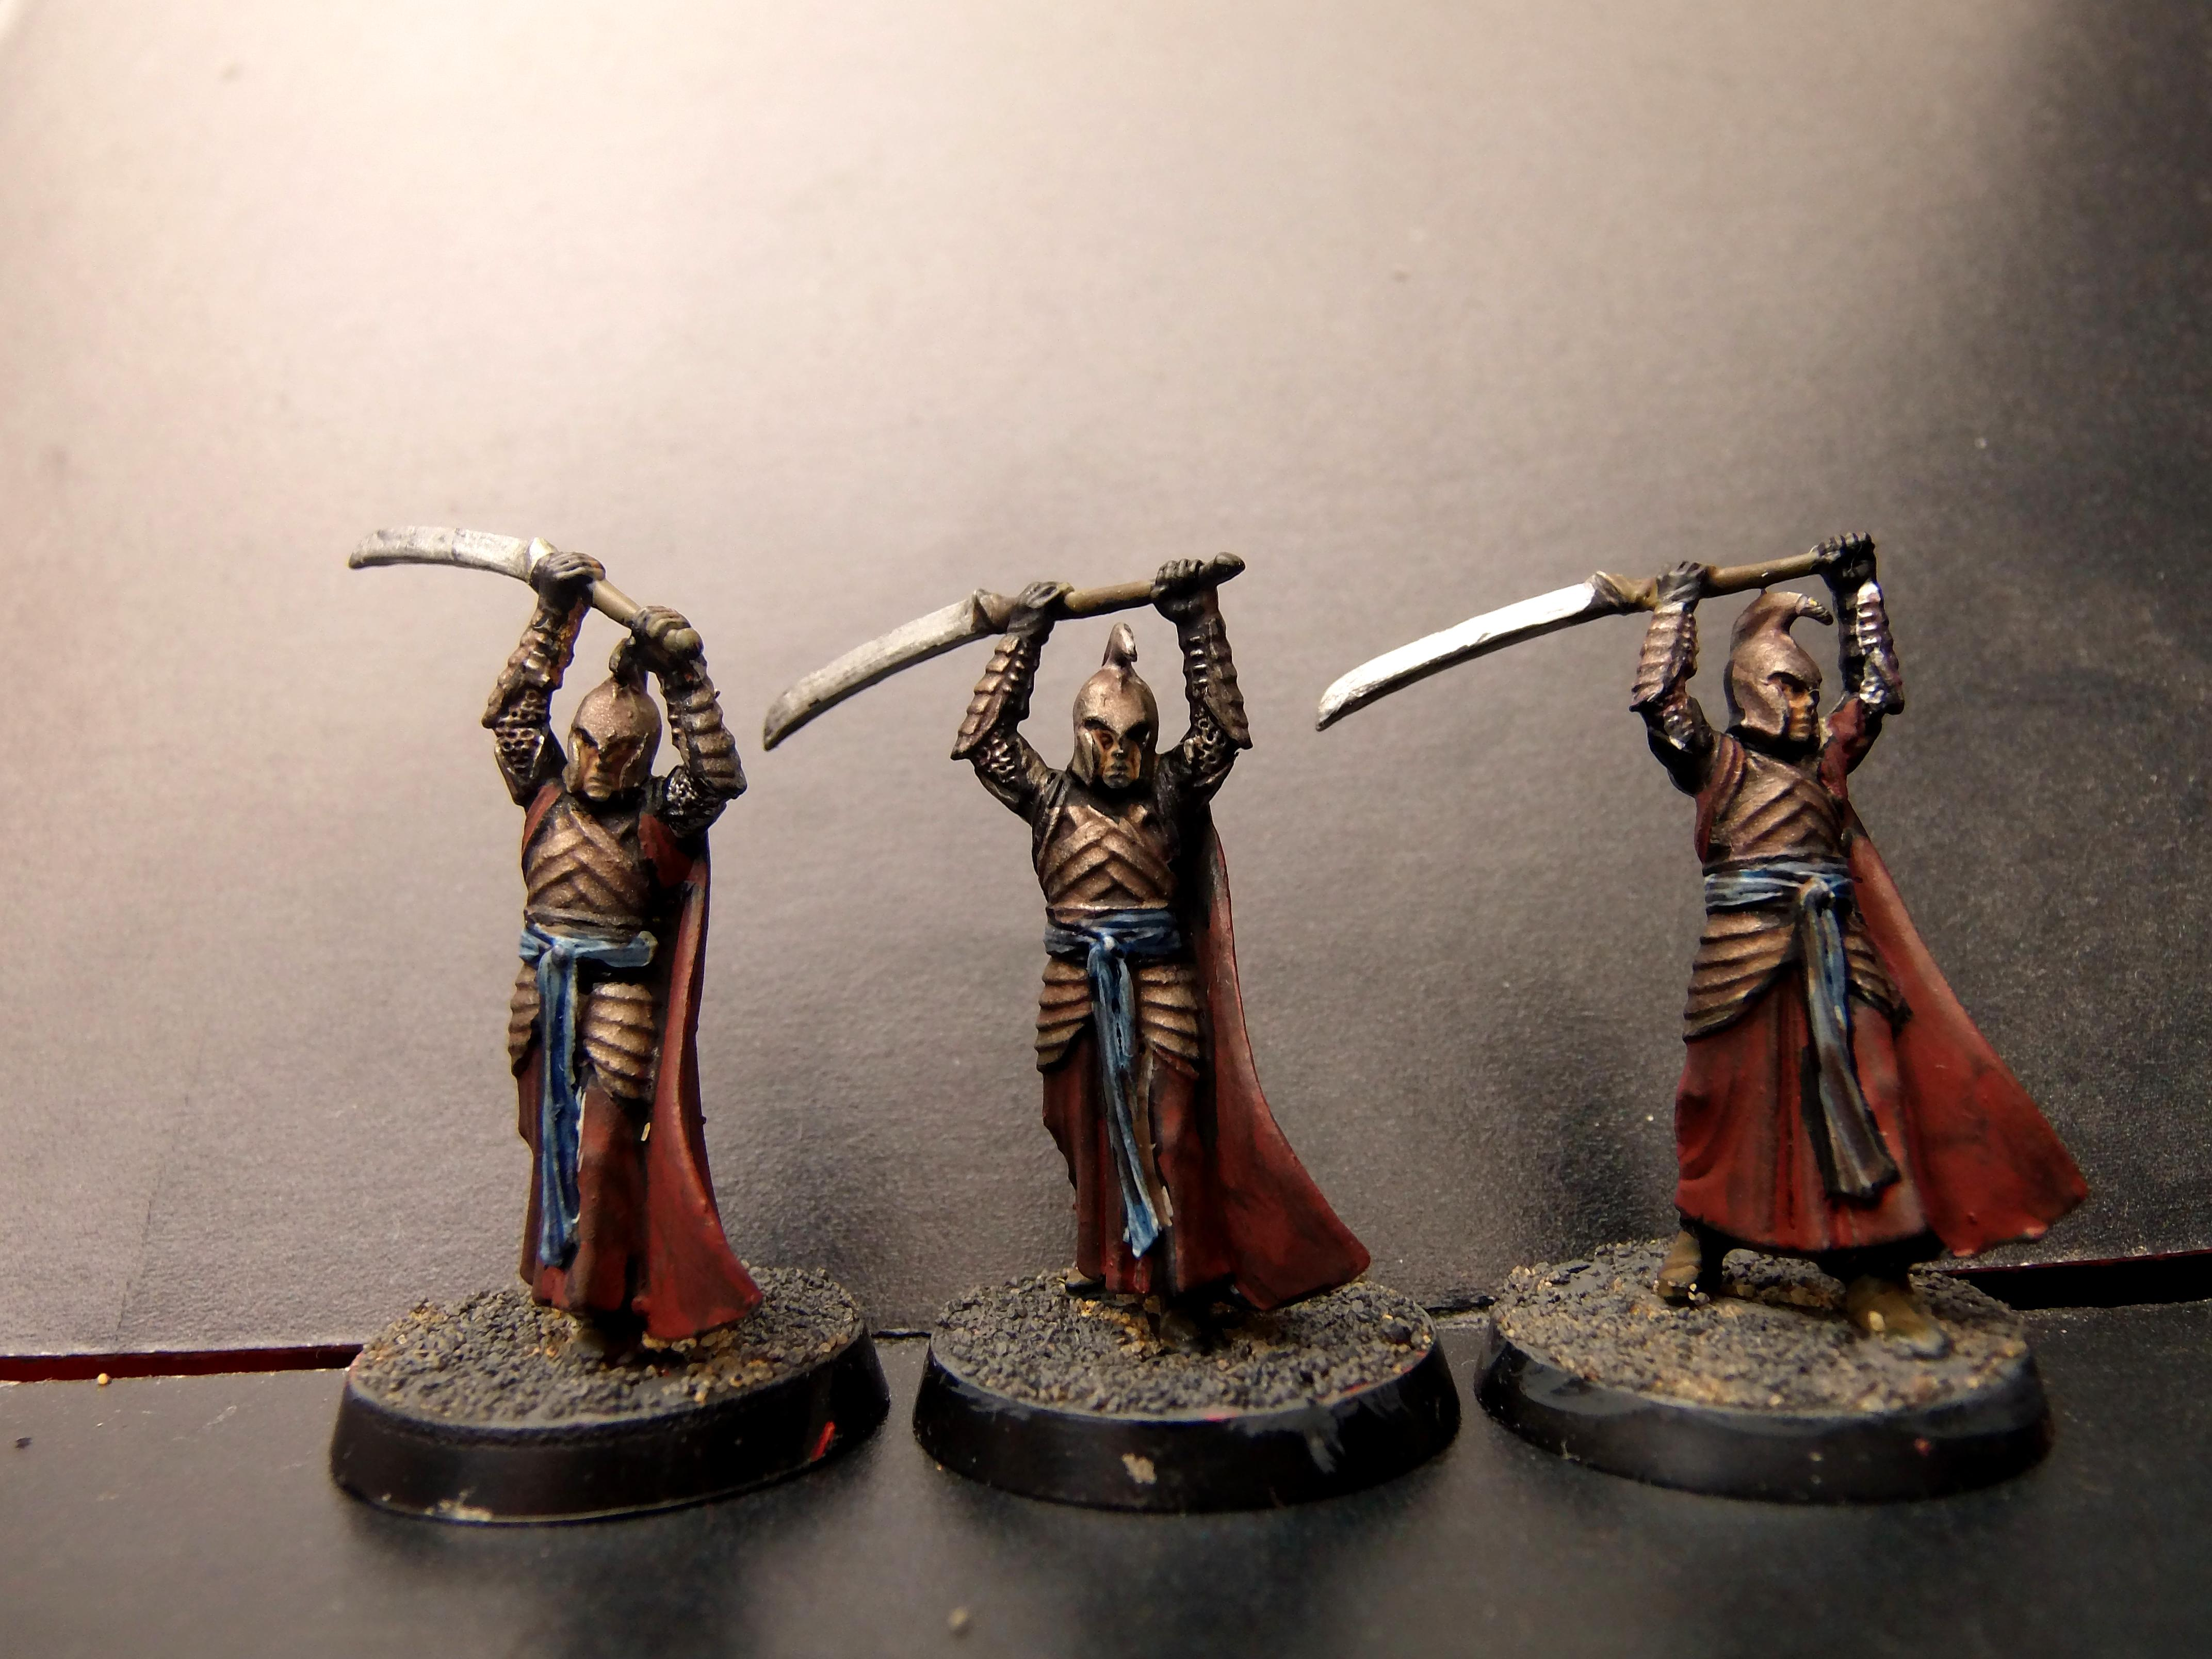 Dwarves, High Elves, Hobbit, Lord Of The Rings